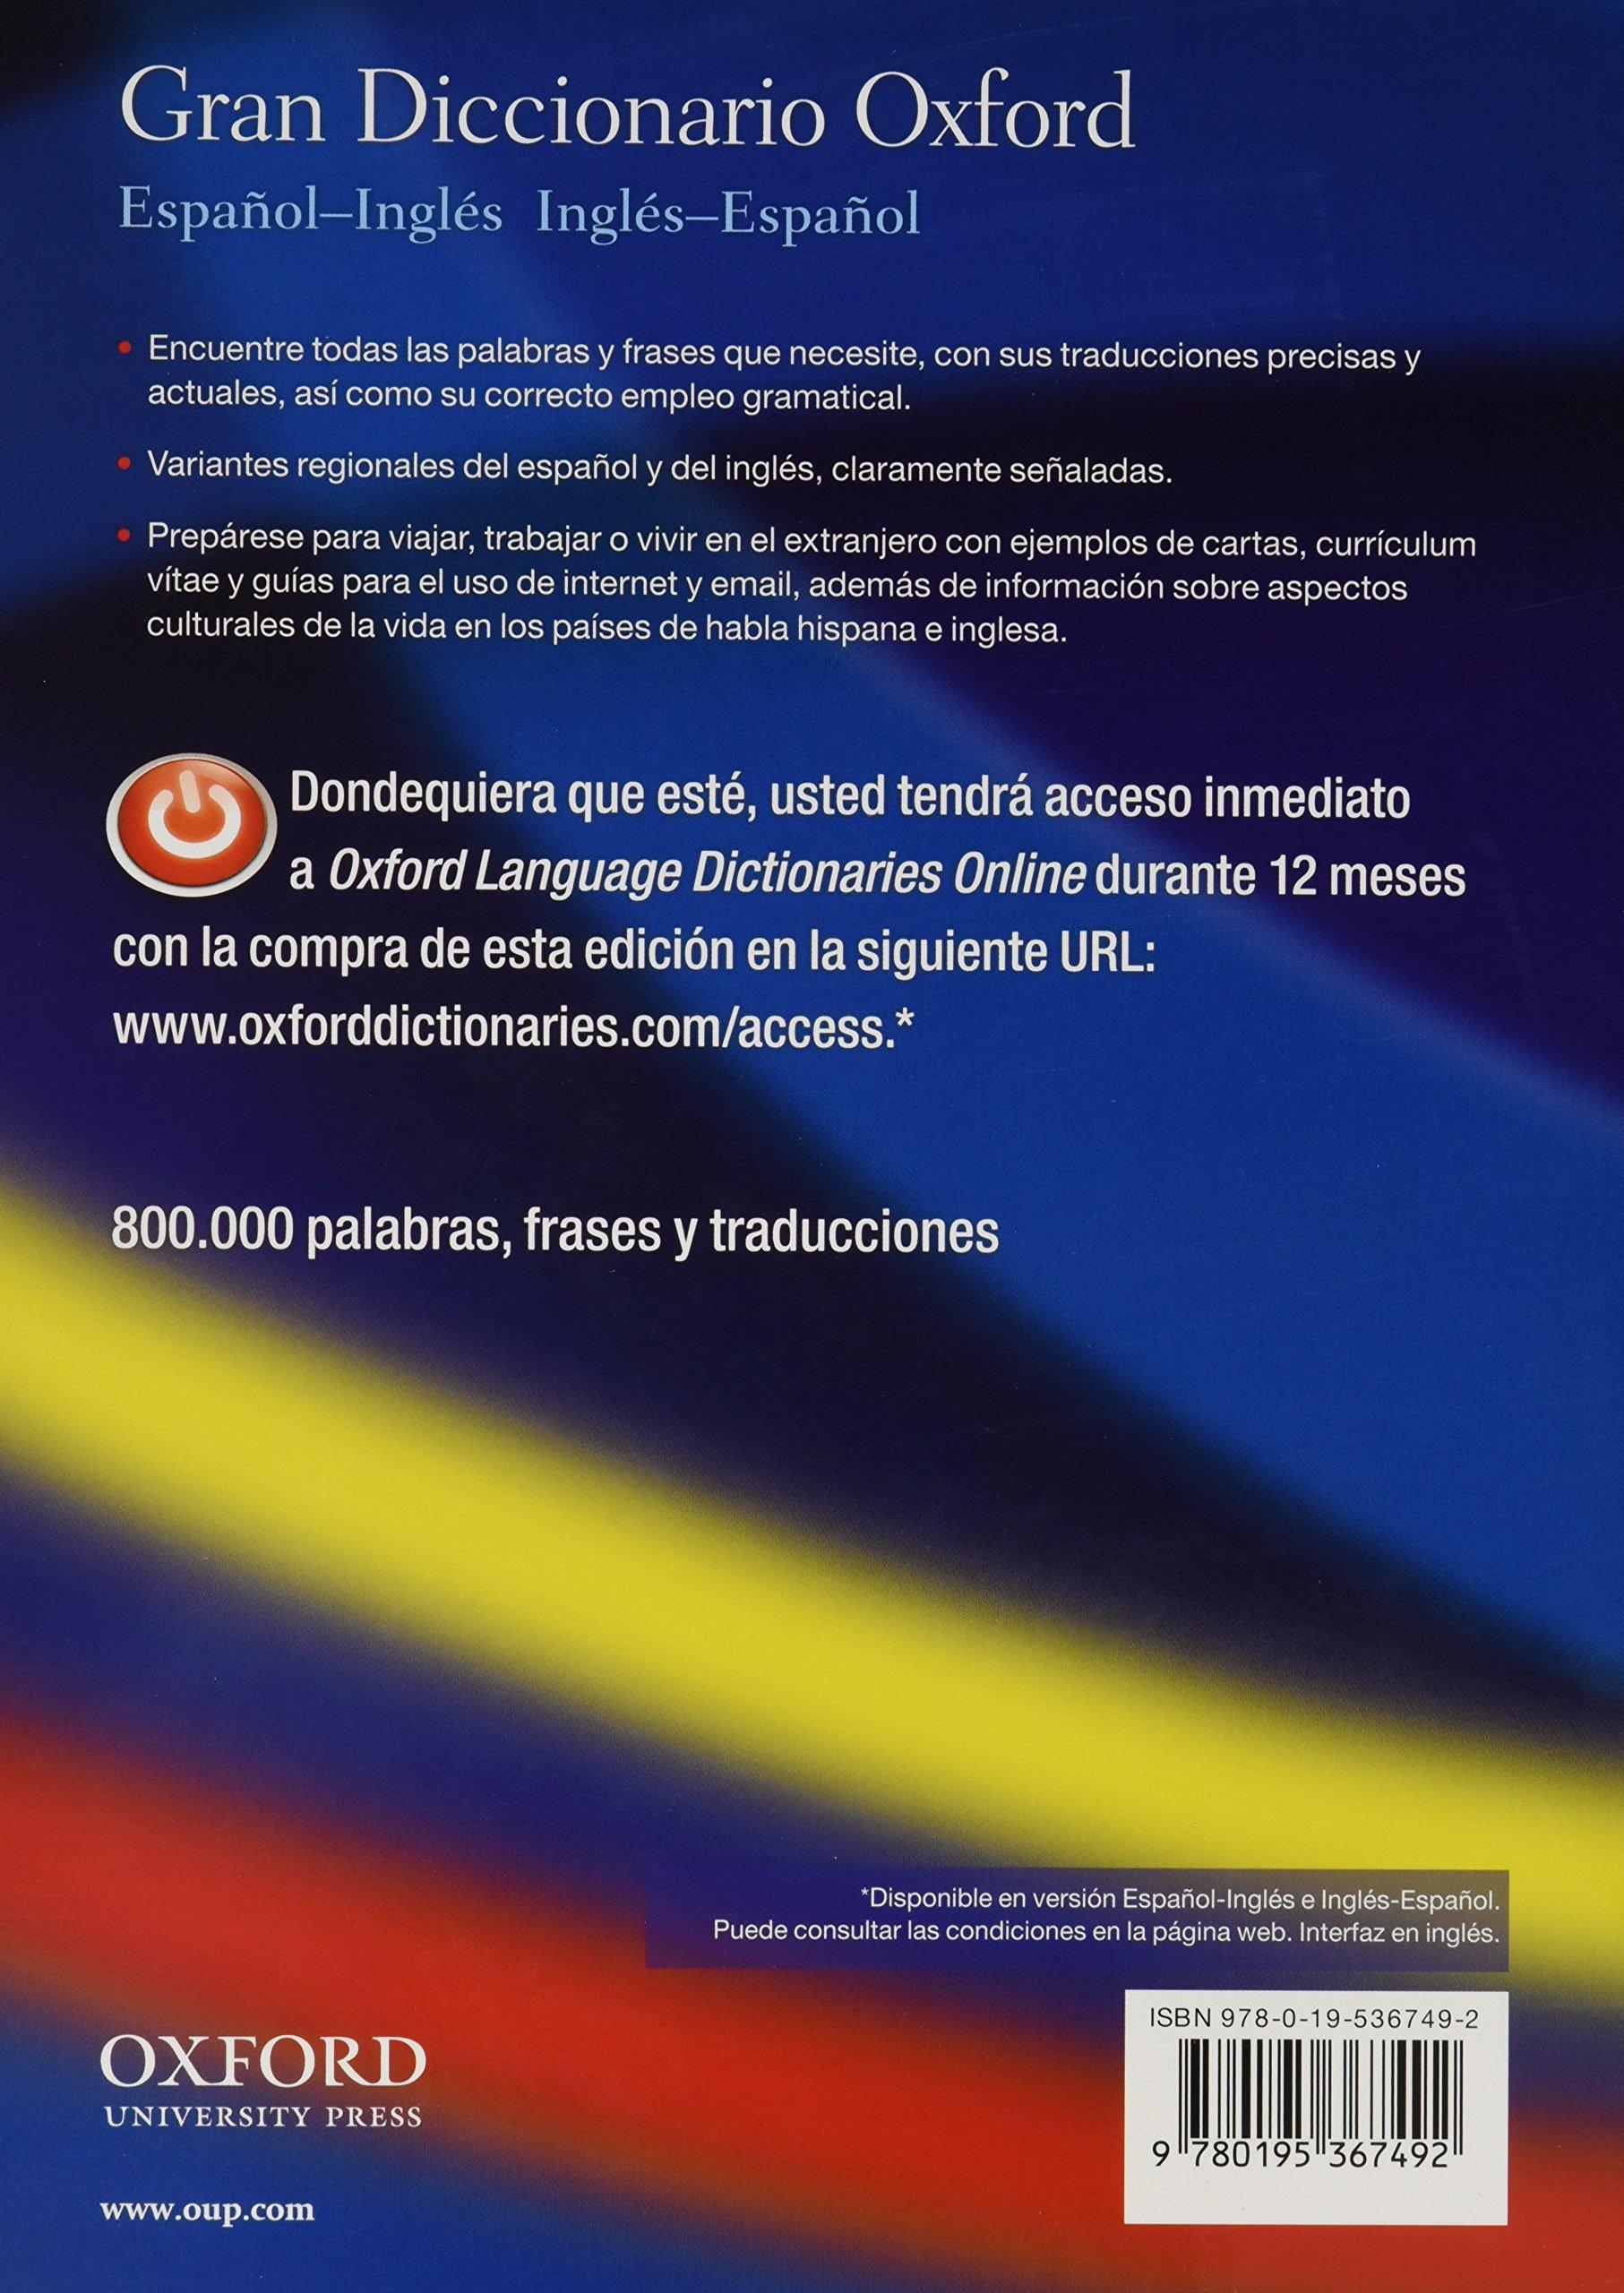 Gran diccionario oxford espa ol ingles ingles espa ol amazon co uk beatriz galimberti jarman 9780195367492 books